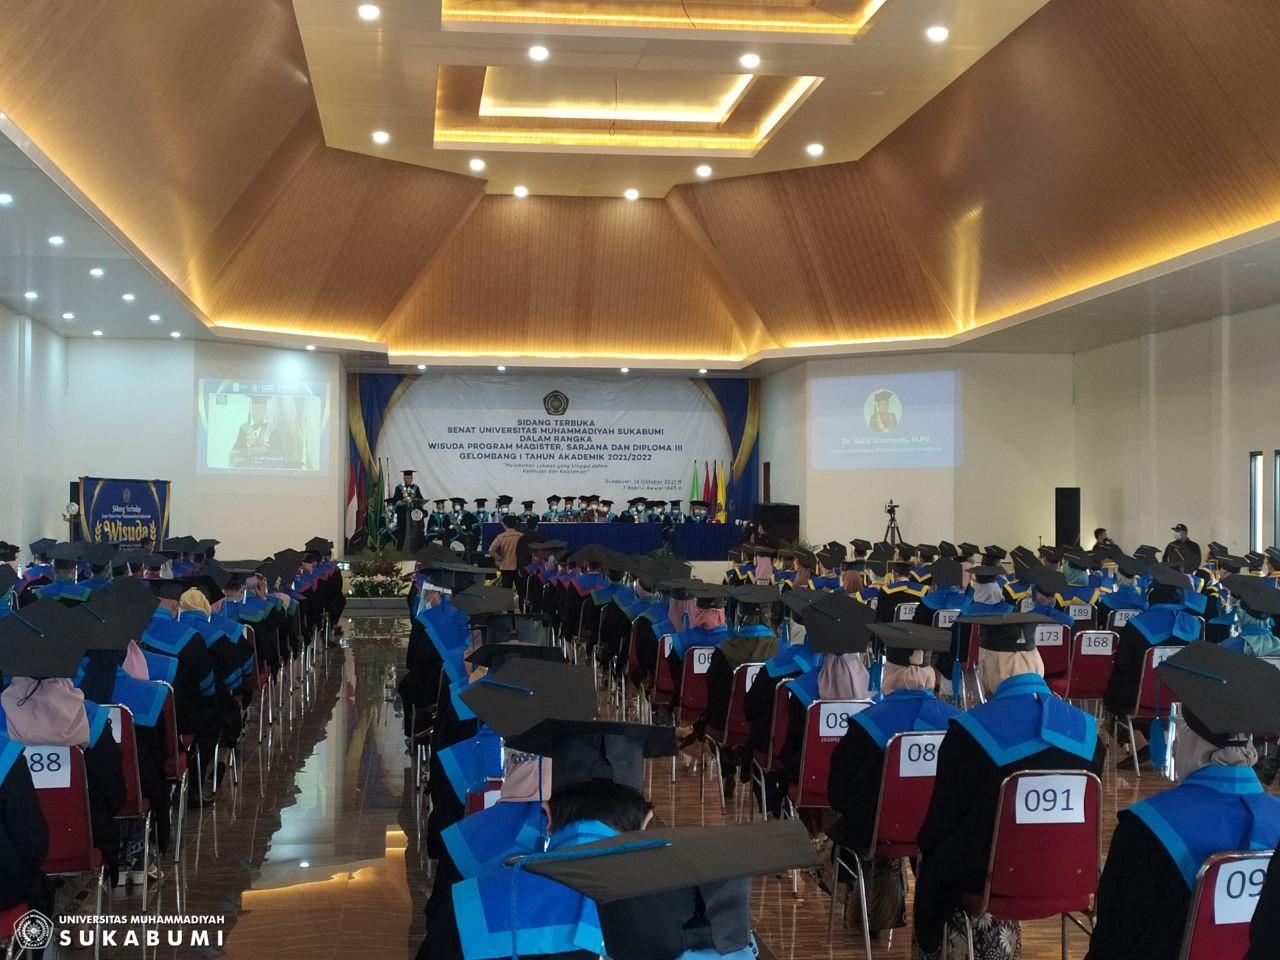 Wisuda Gelombang I : UMMI Sukses Wisuda 650 Lulusan Magister, Sarjana dan Ahli Madya